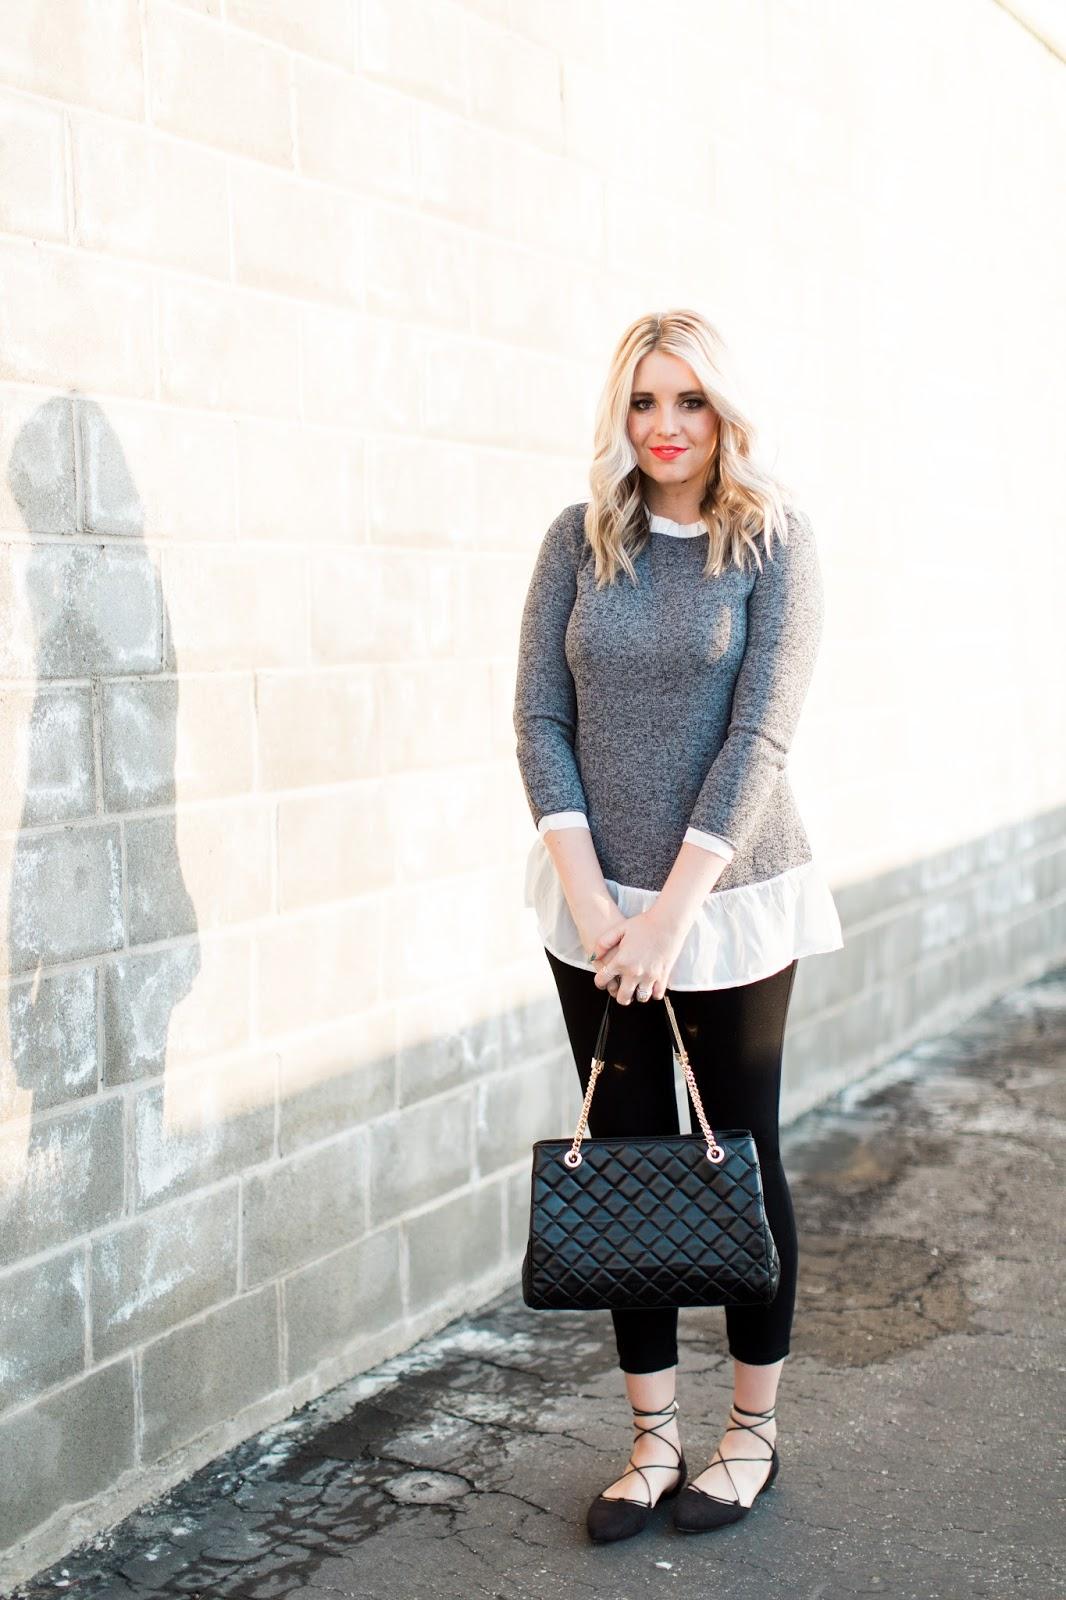 Michael Kors Purse, Utah Fashion Blogger, Choies